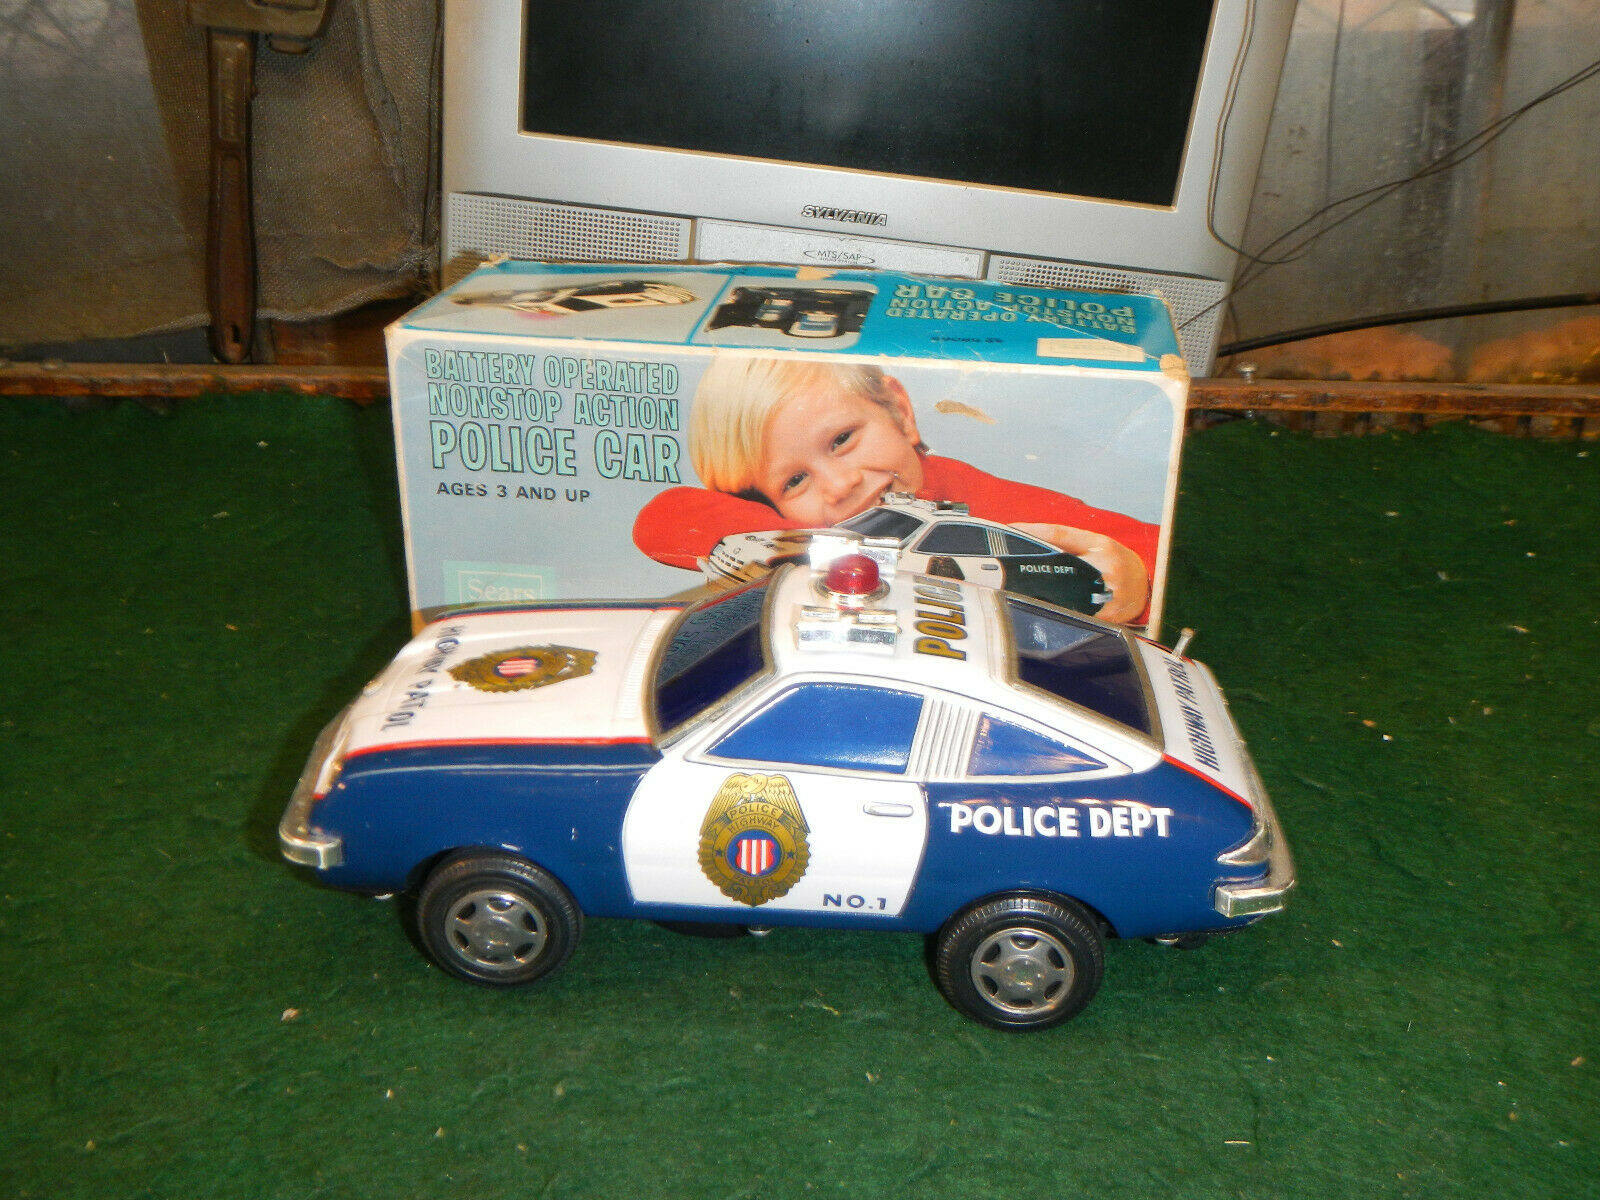 VINTAGE 1970'S POLICE CAR SEARS JAPAN WITH ORIGINAL BOX